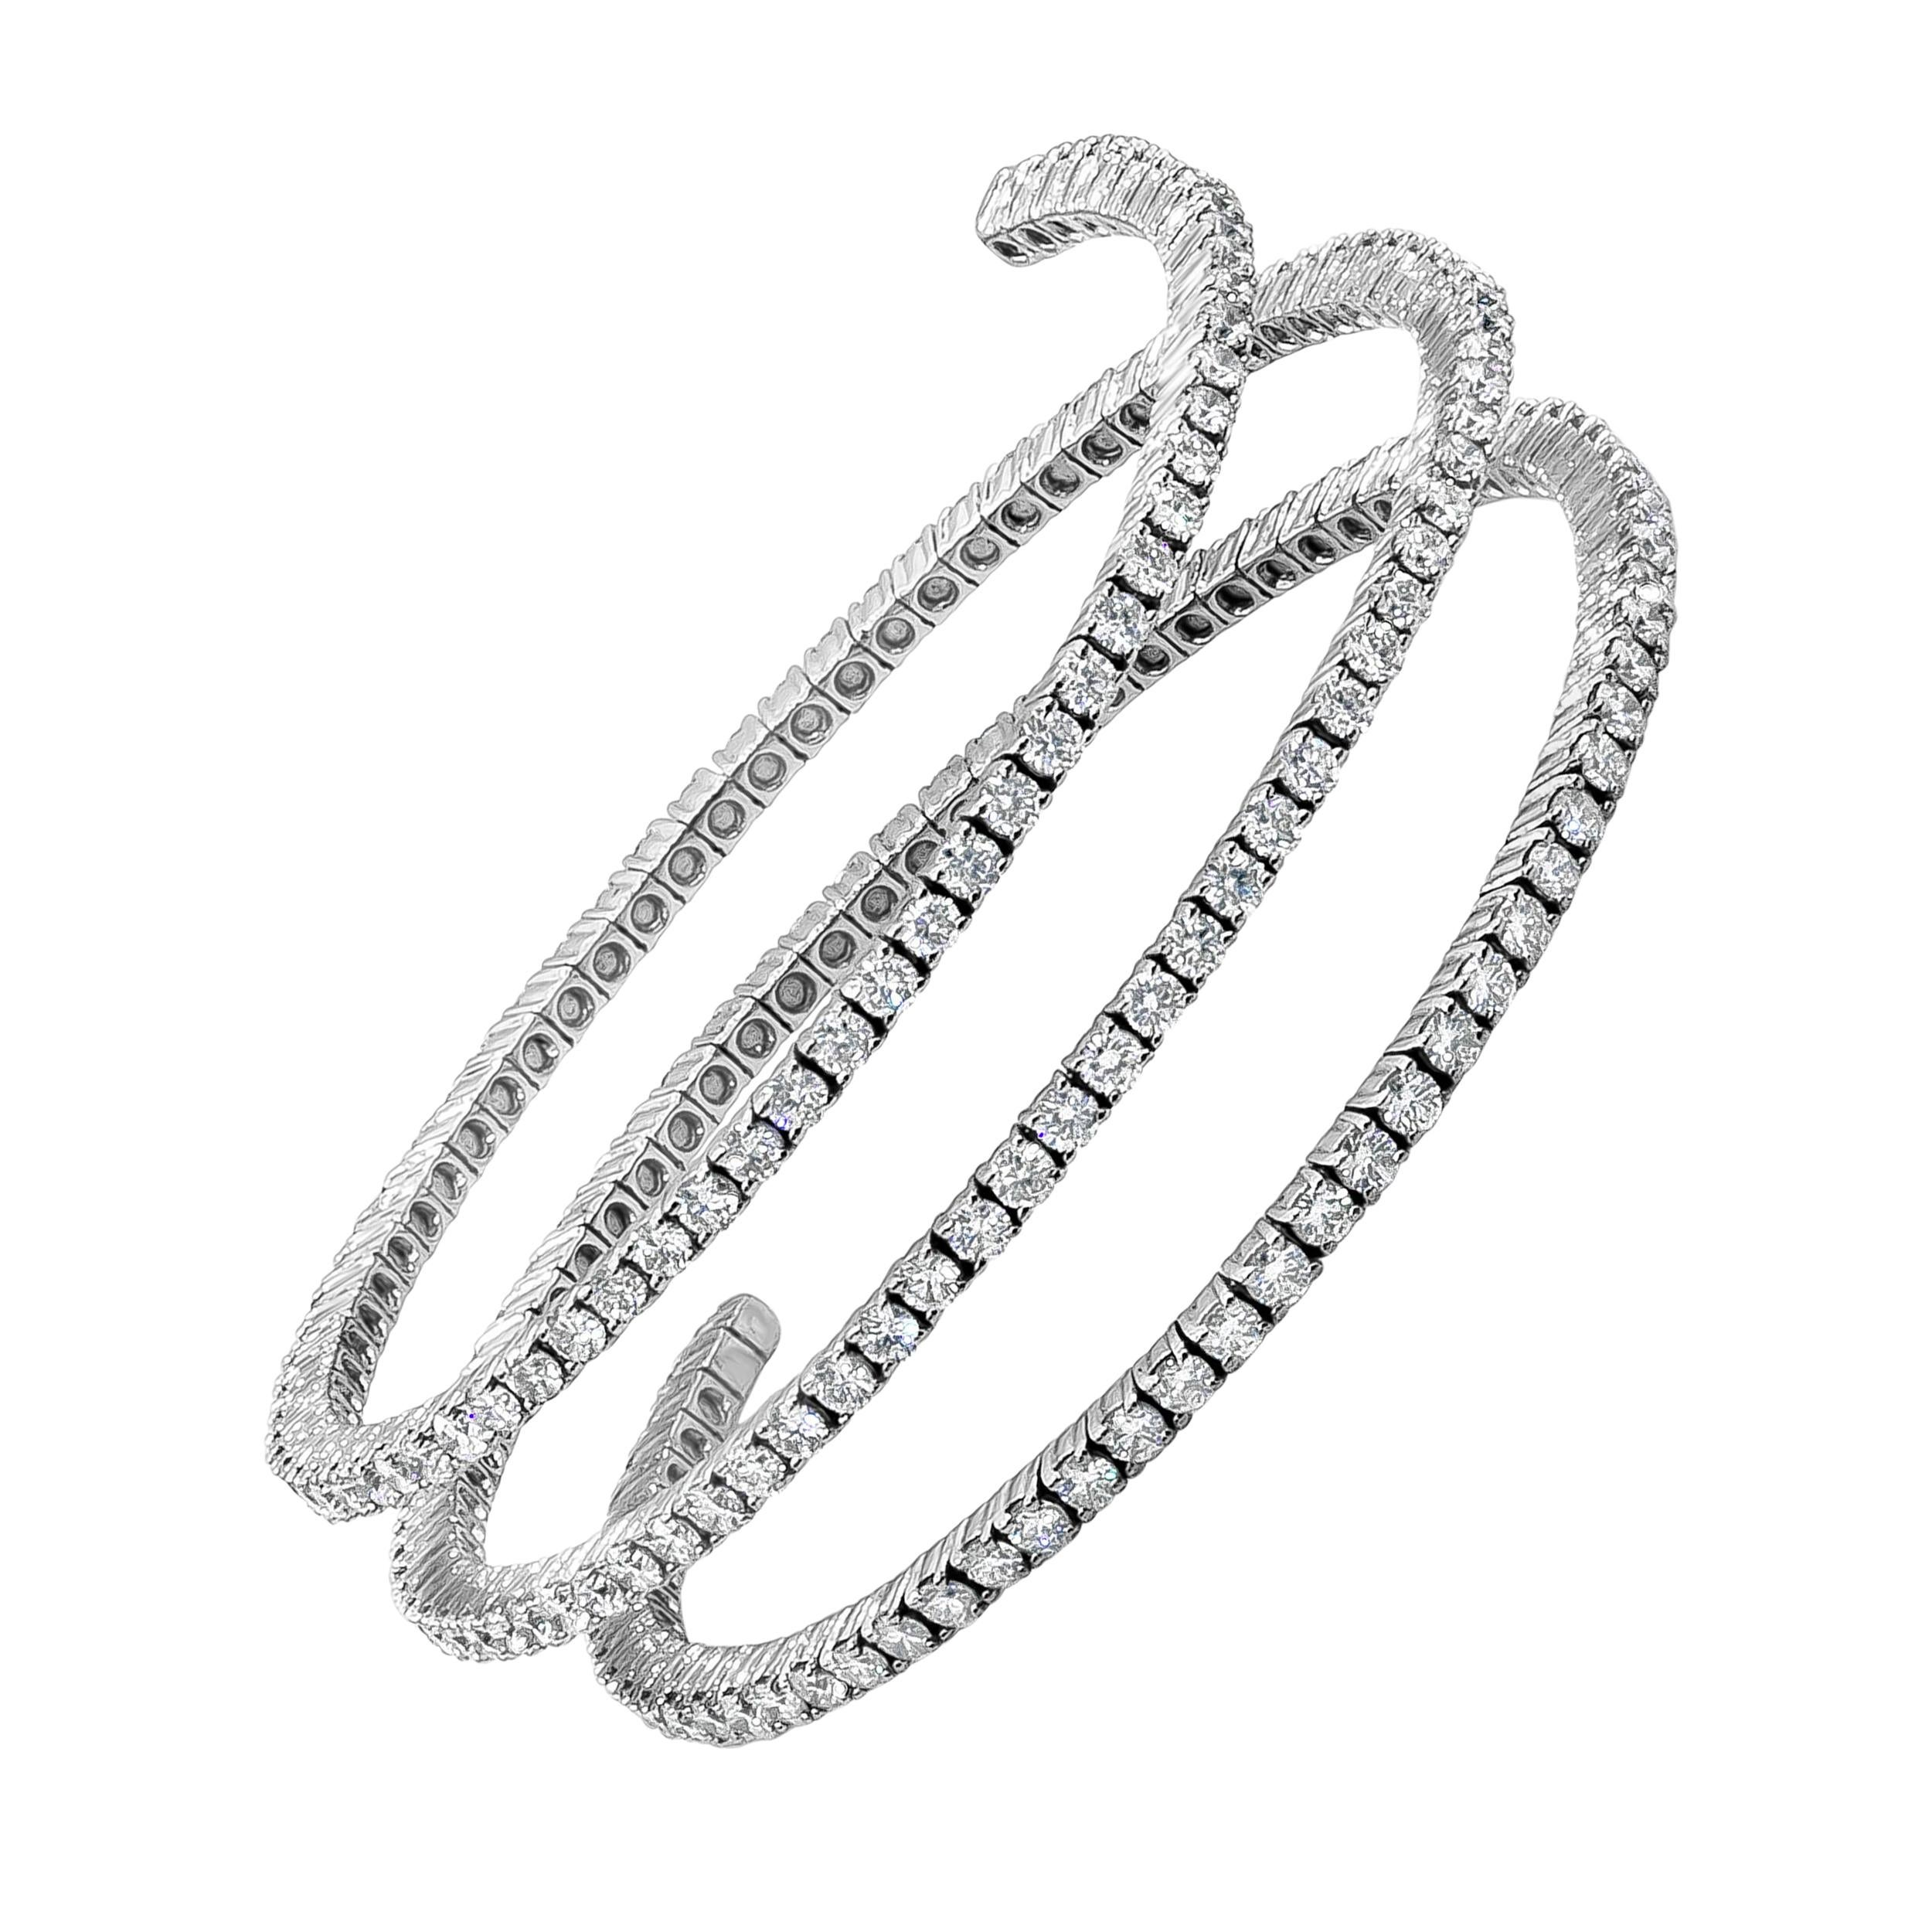 Roman Malakov 10.83 Carat Round Diamond Three-Row Spiral Bangle Bracelet